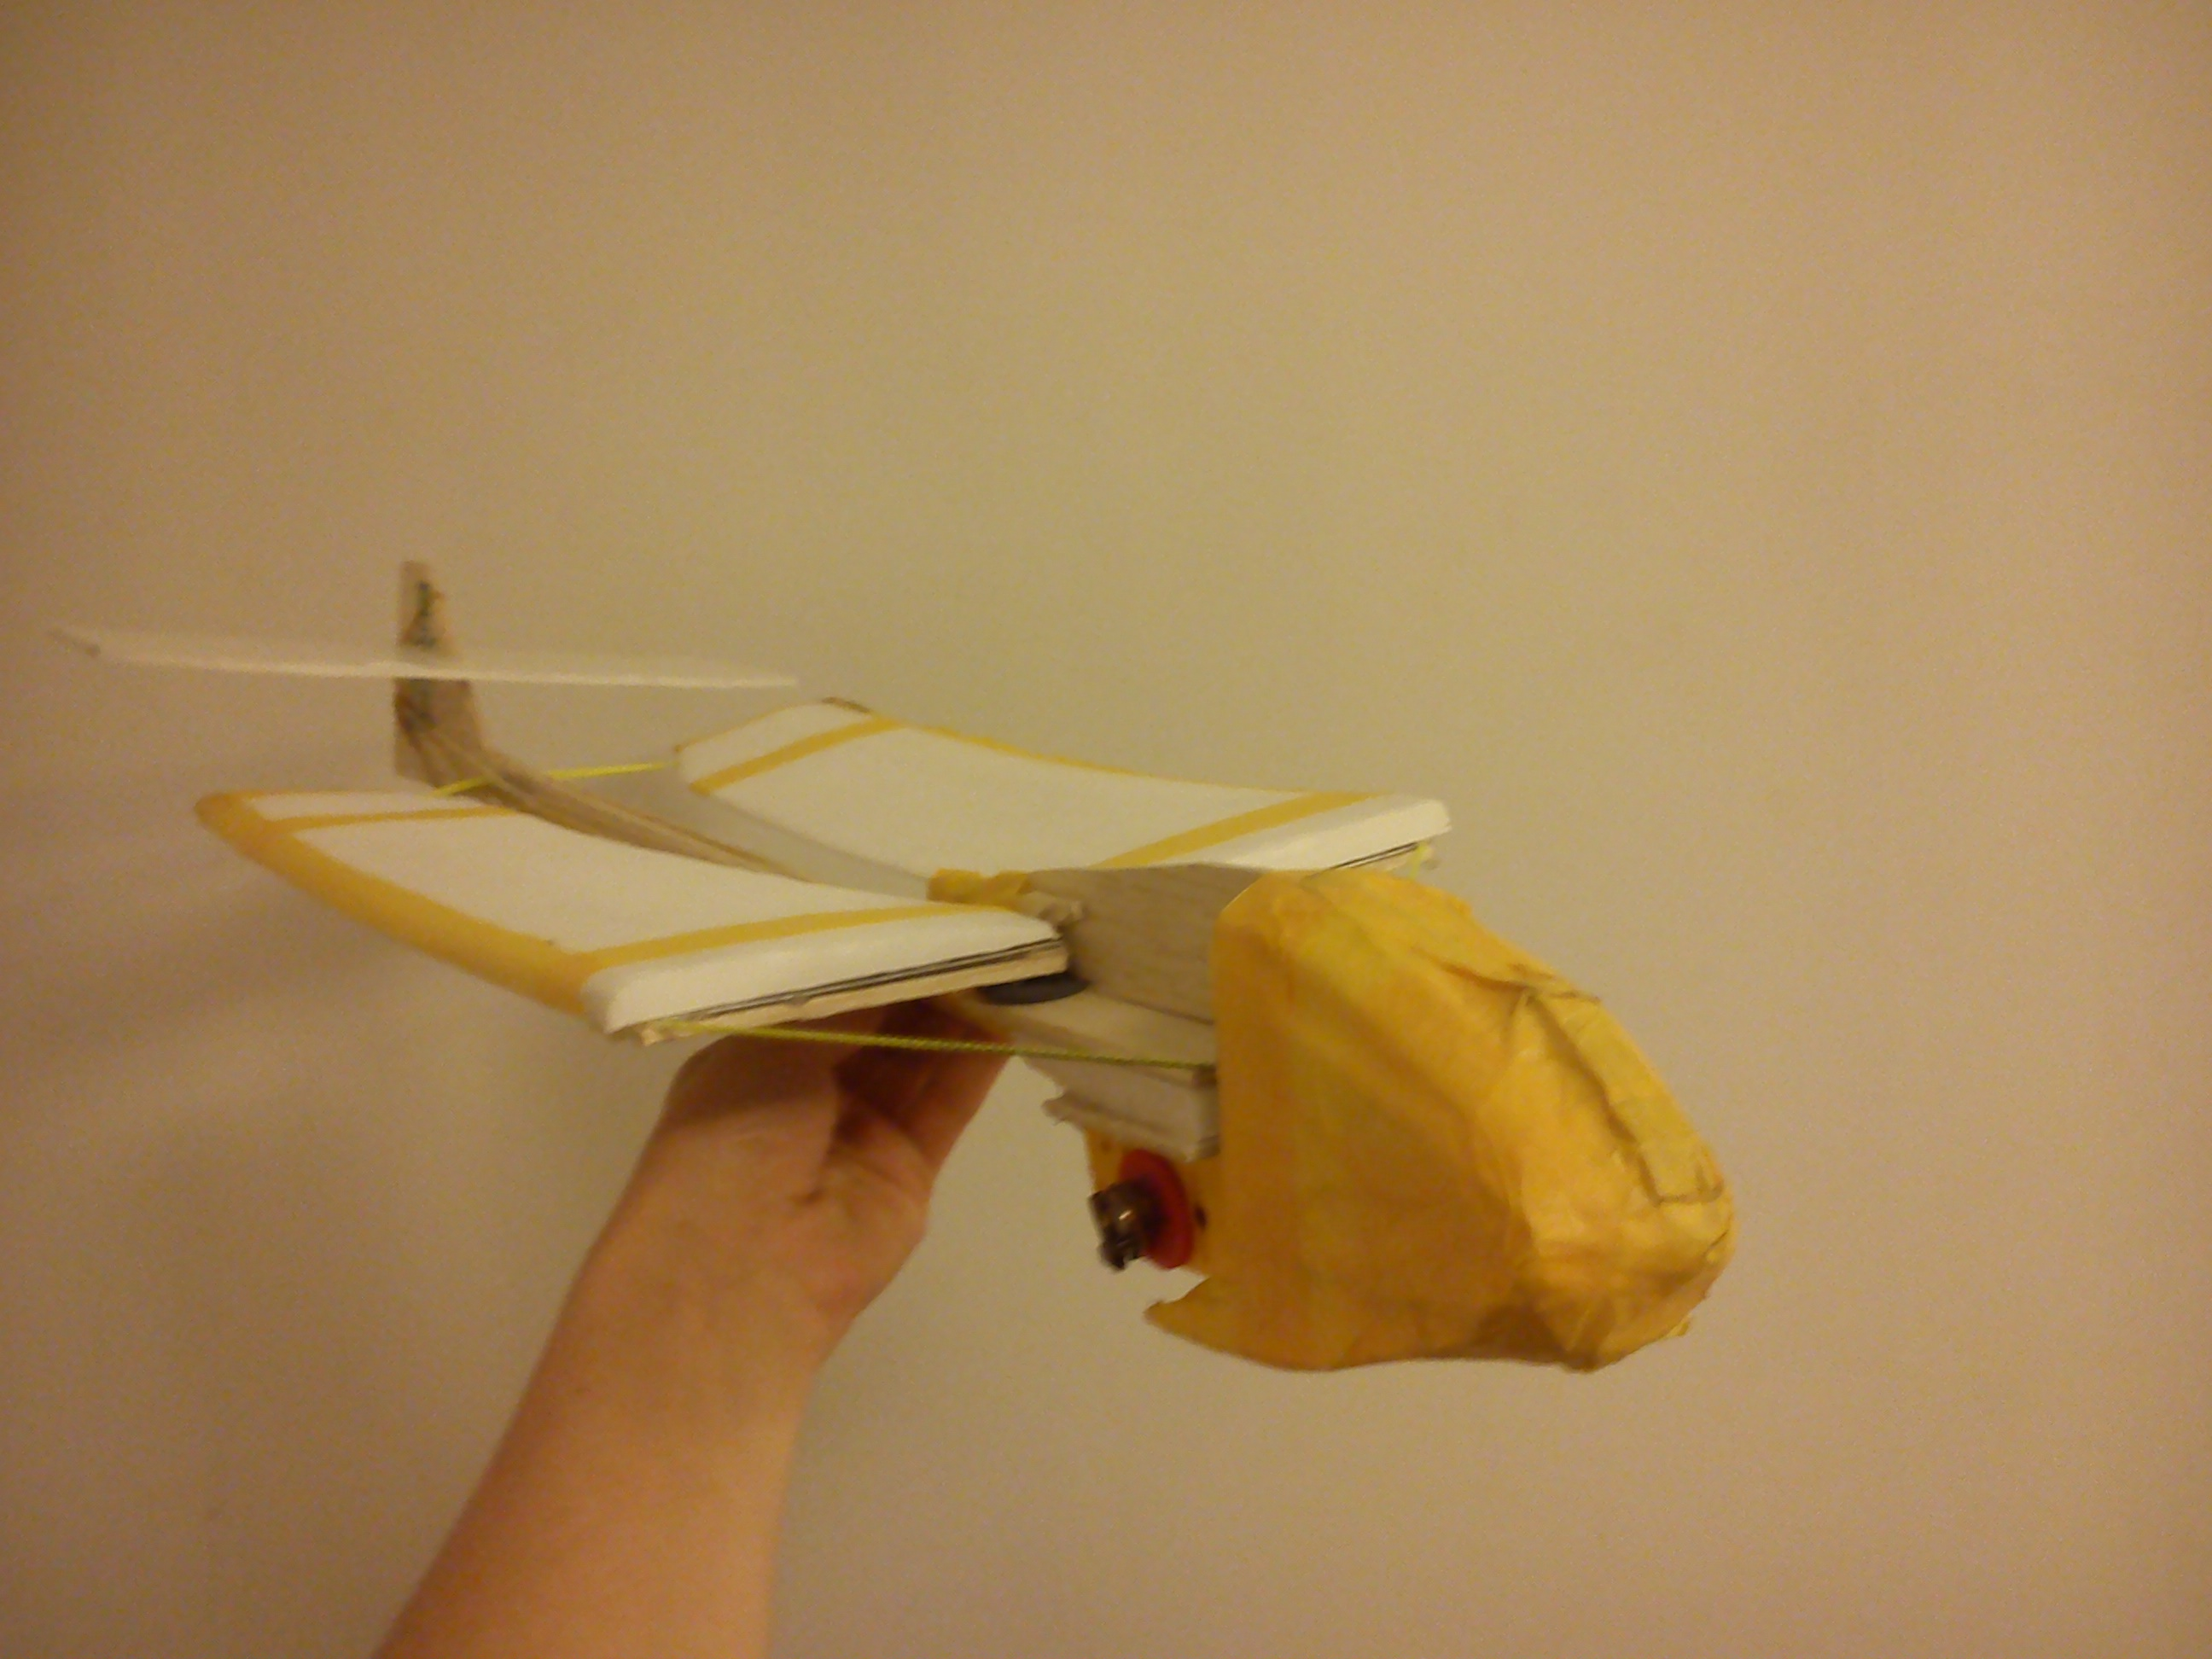 Picture of Flip Open Plane